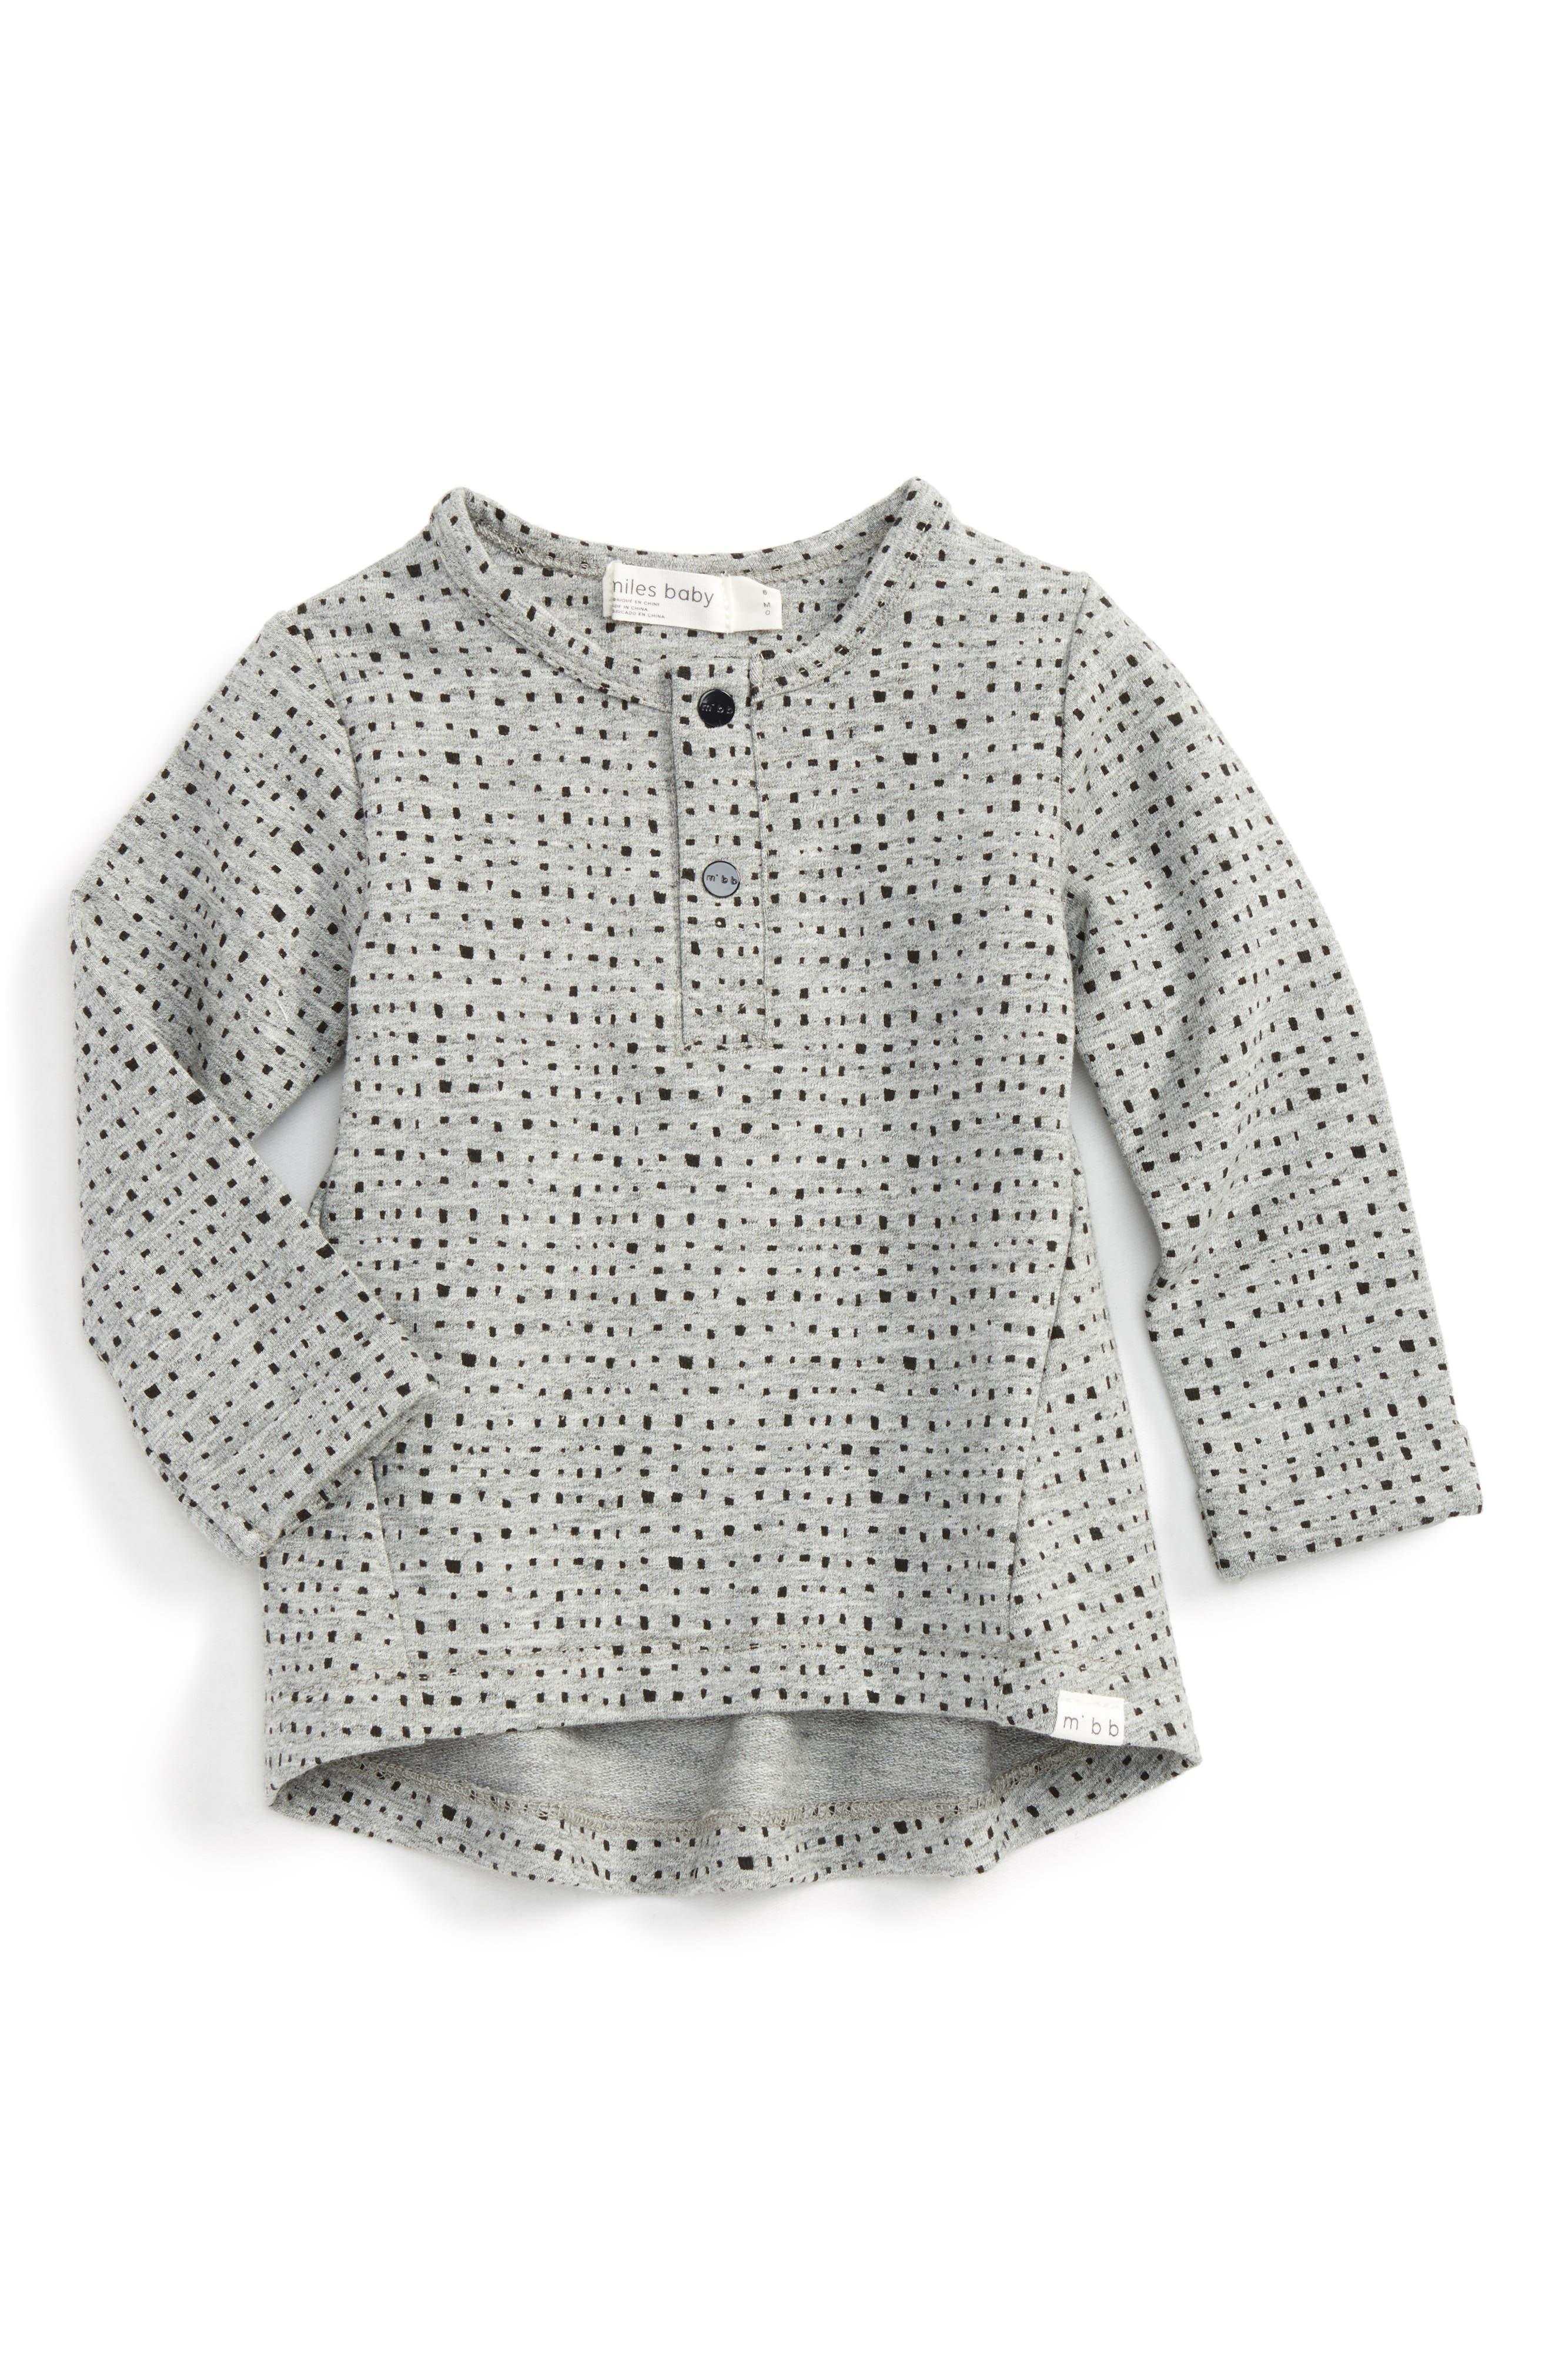 Main Image - Miles Baby Knit Tunic (Baby)